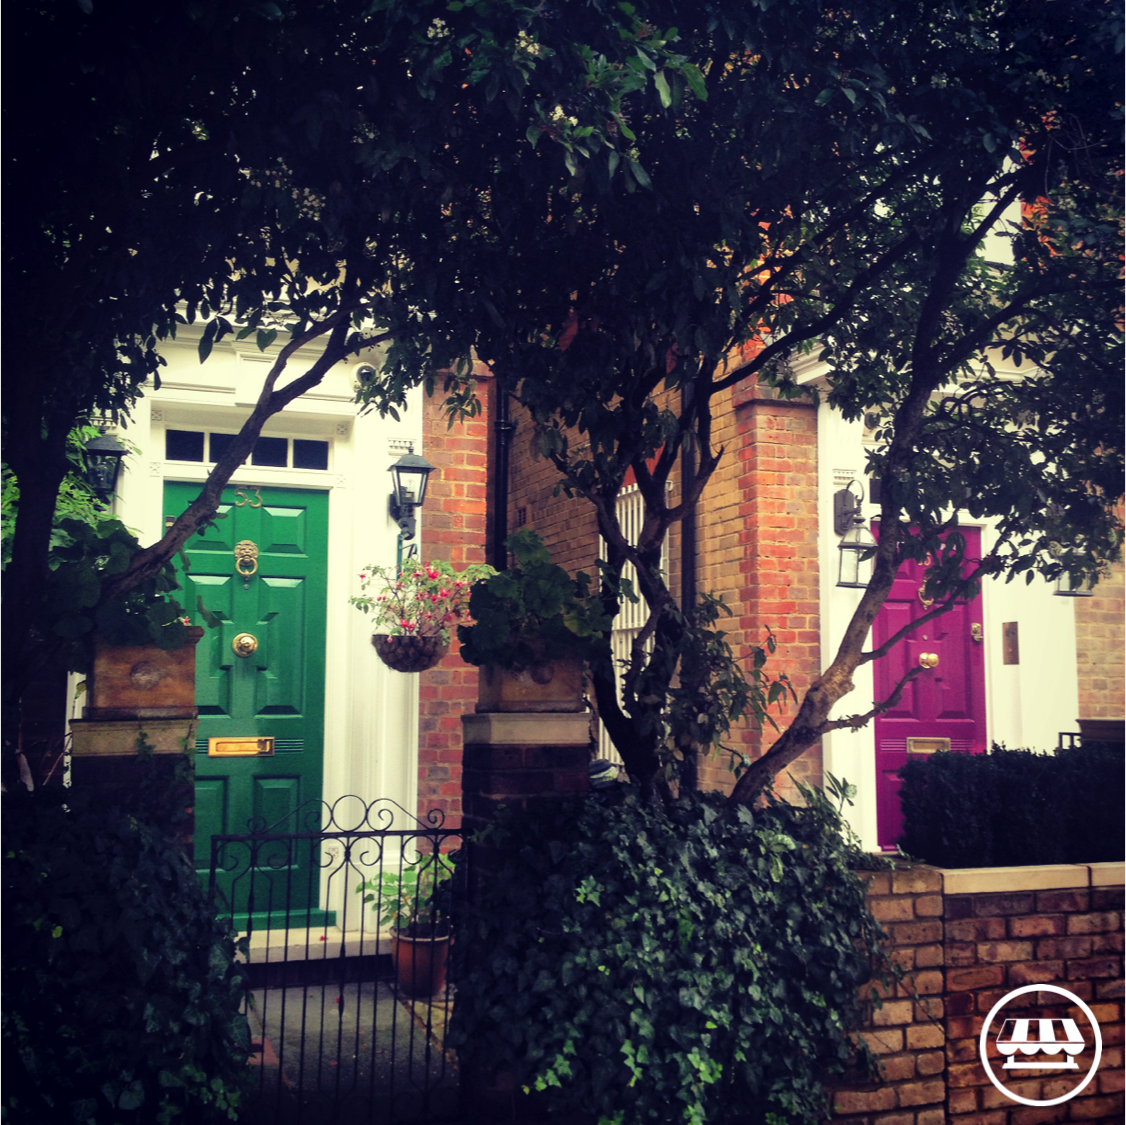 London Doors in Kensington